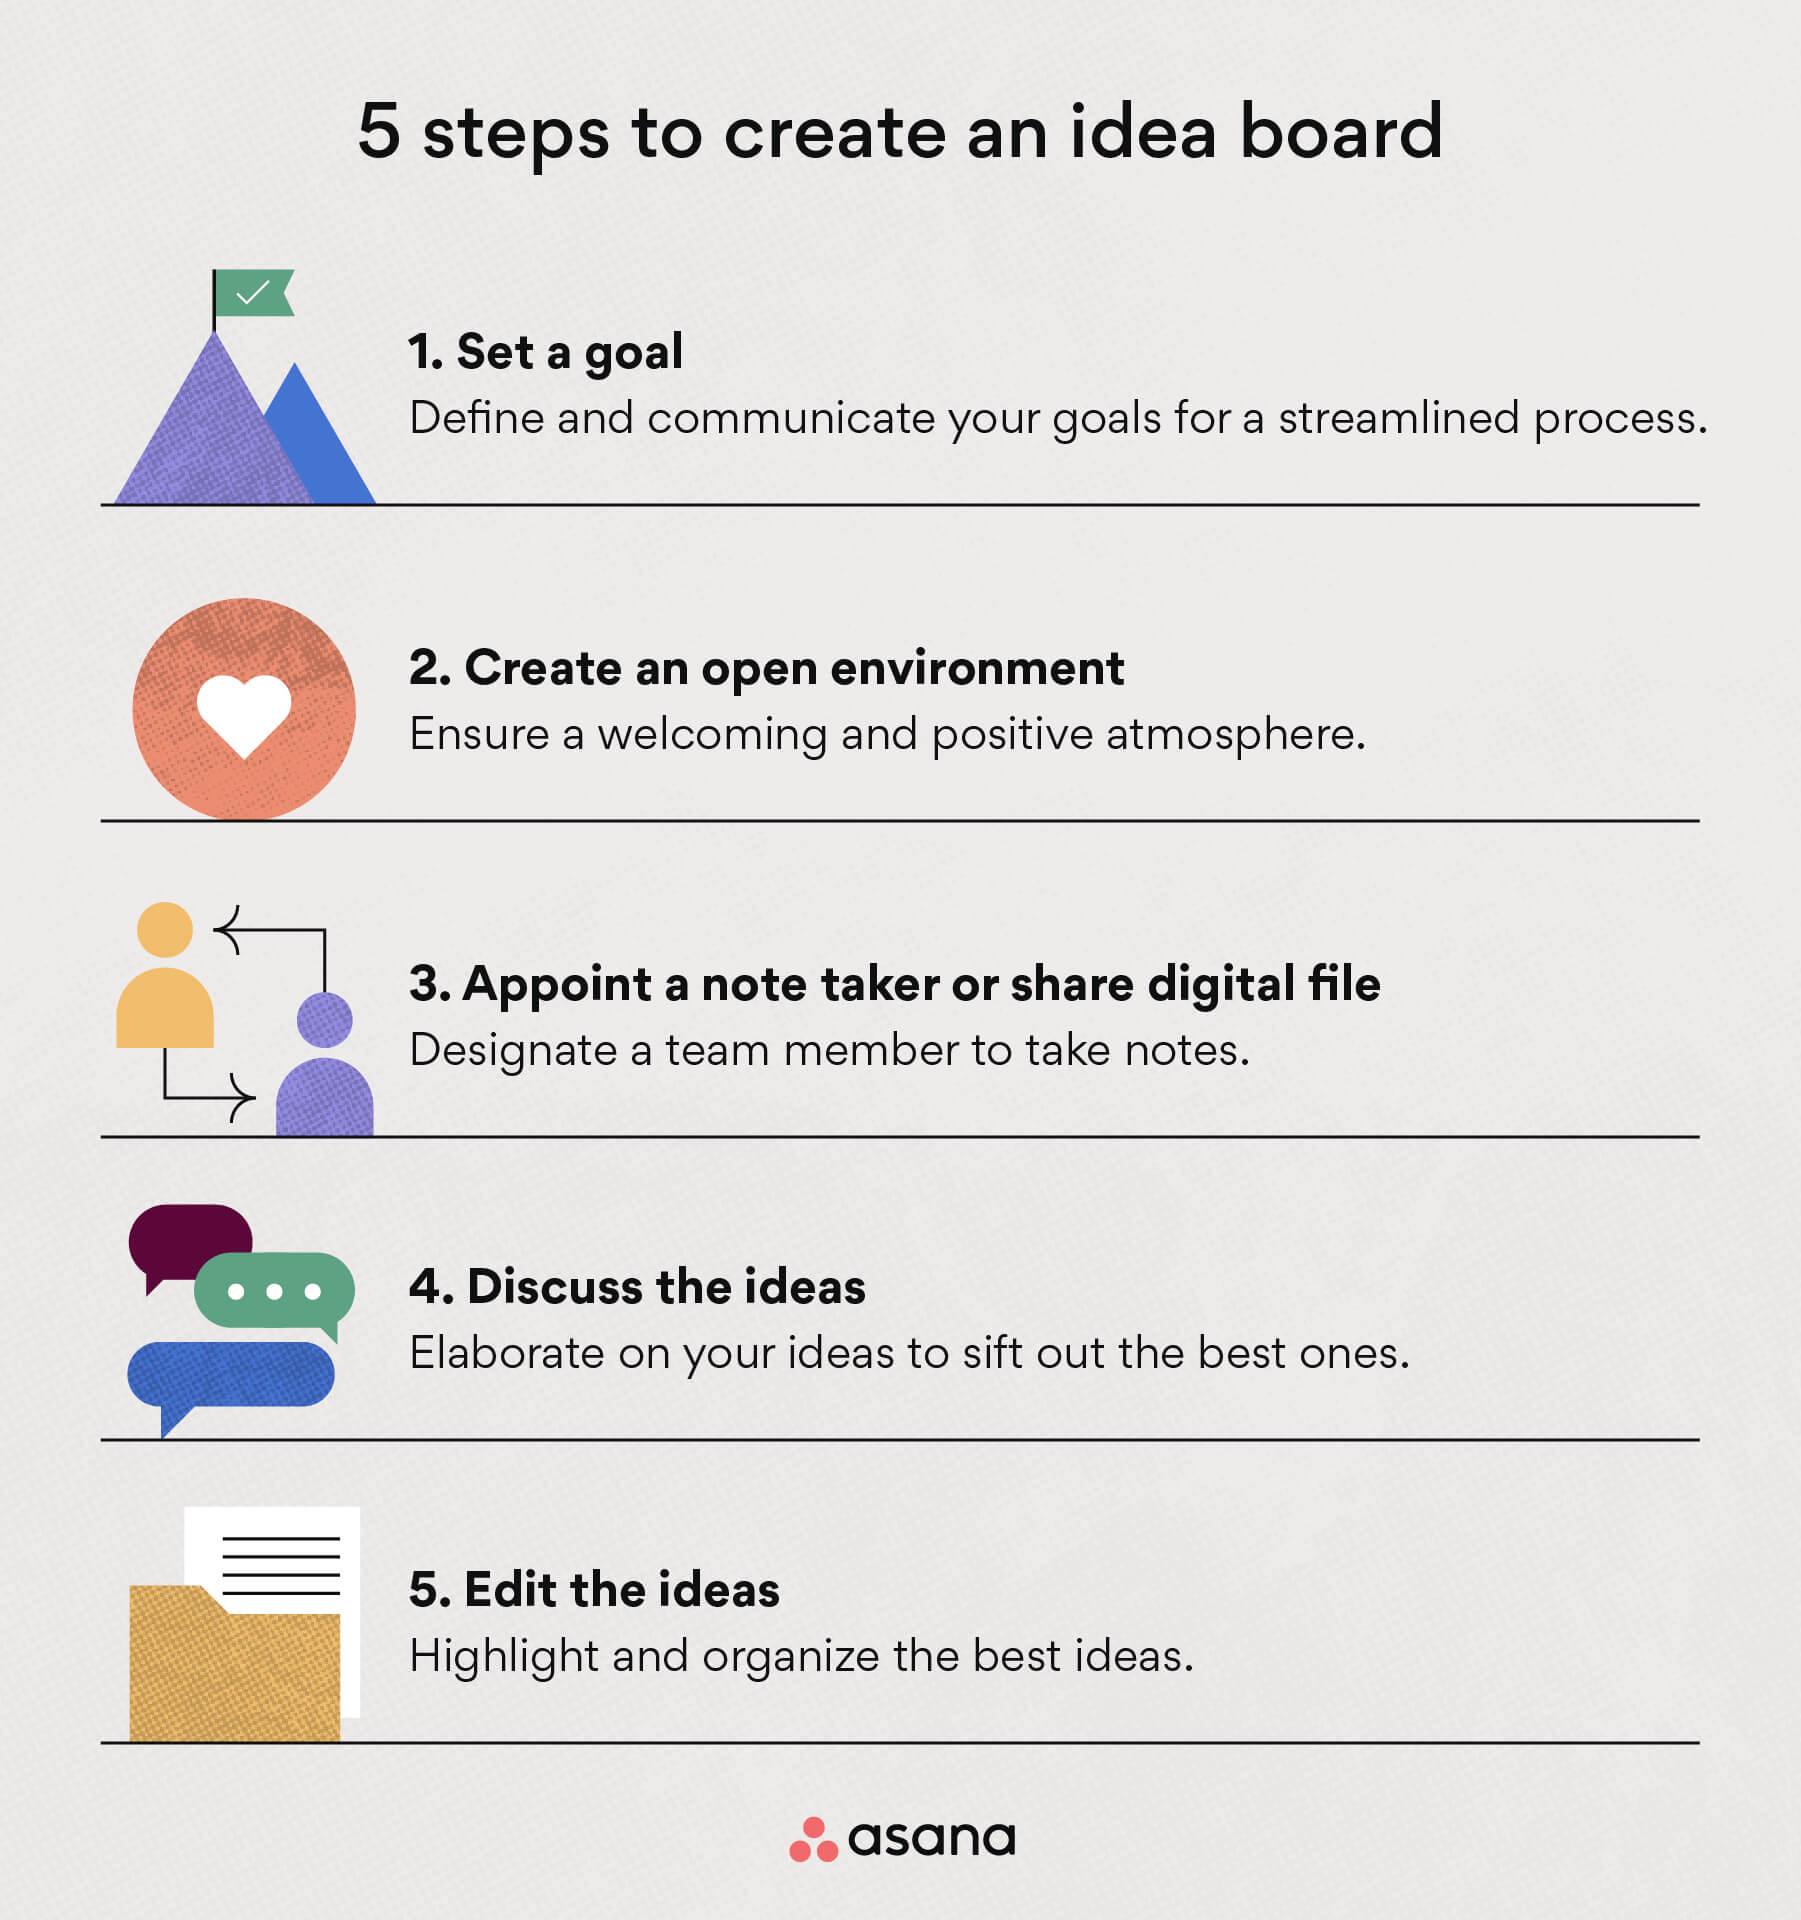 How to create an idea board